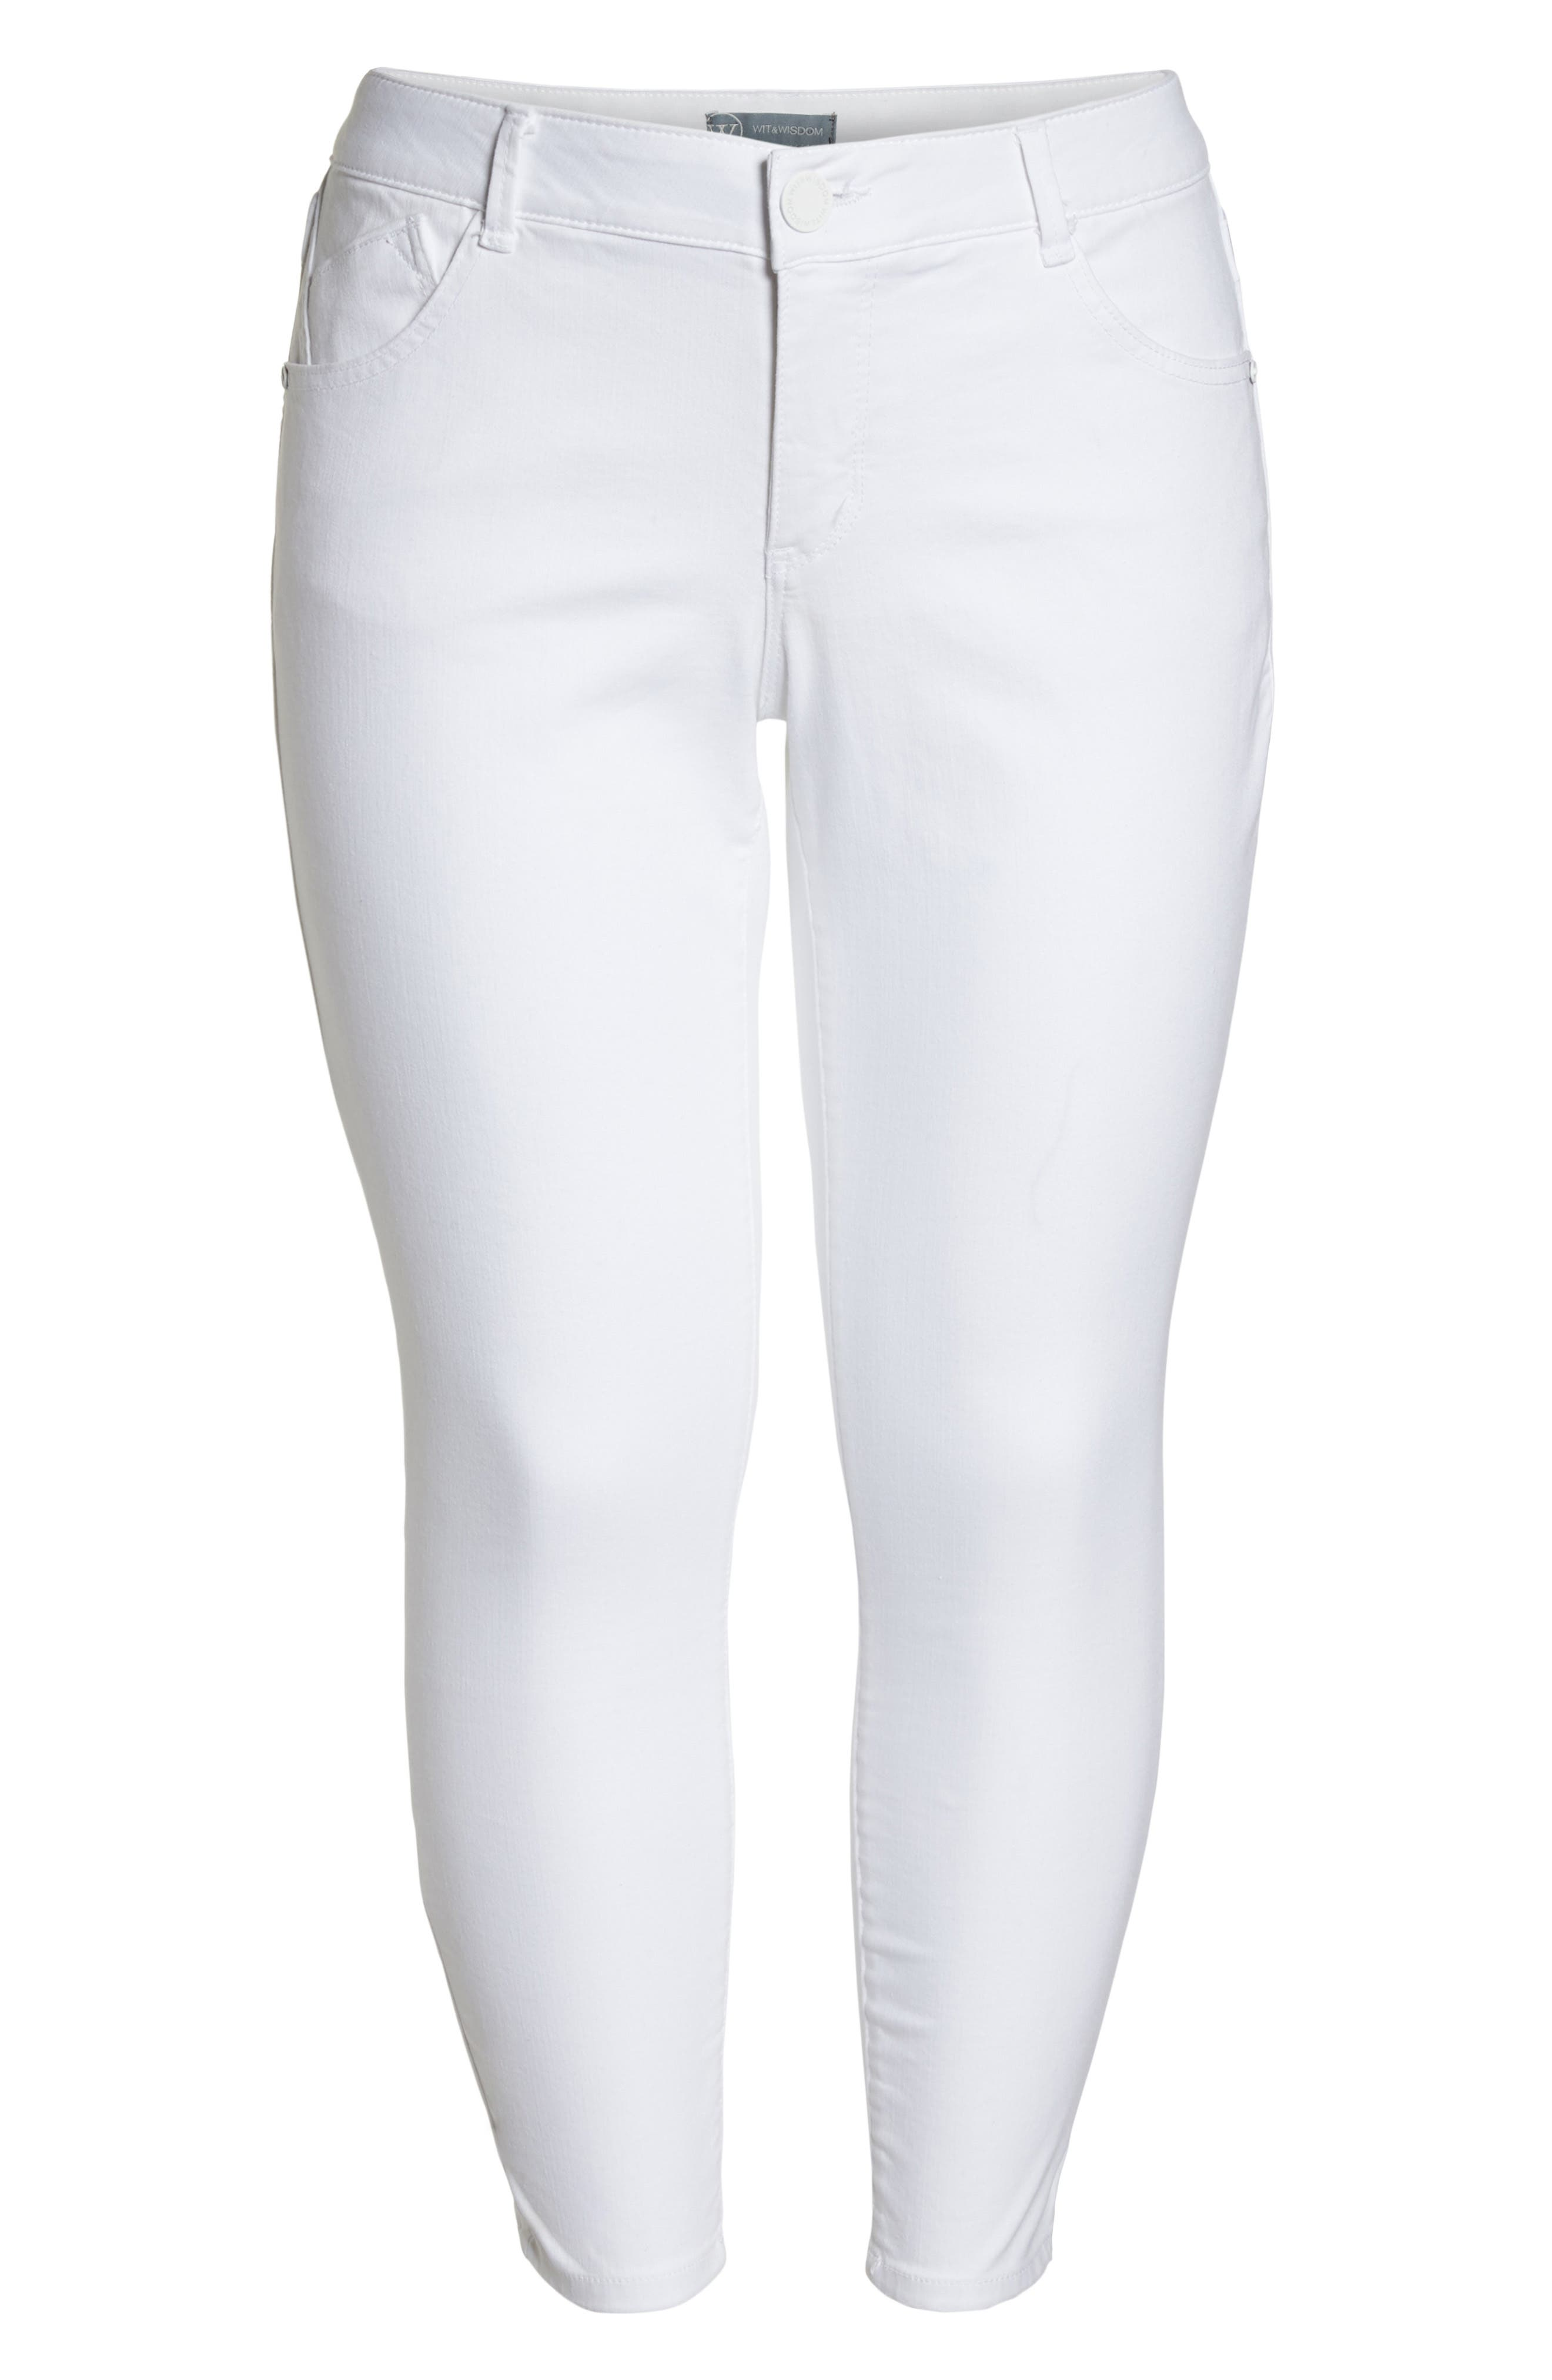 Ab-solution Ankle Skimmer Jeans,                             Alternate thumbnail 7, color,                             106